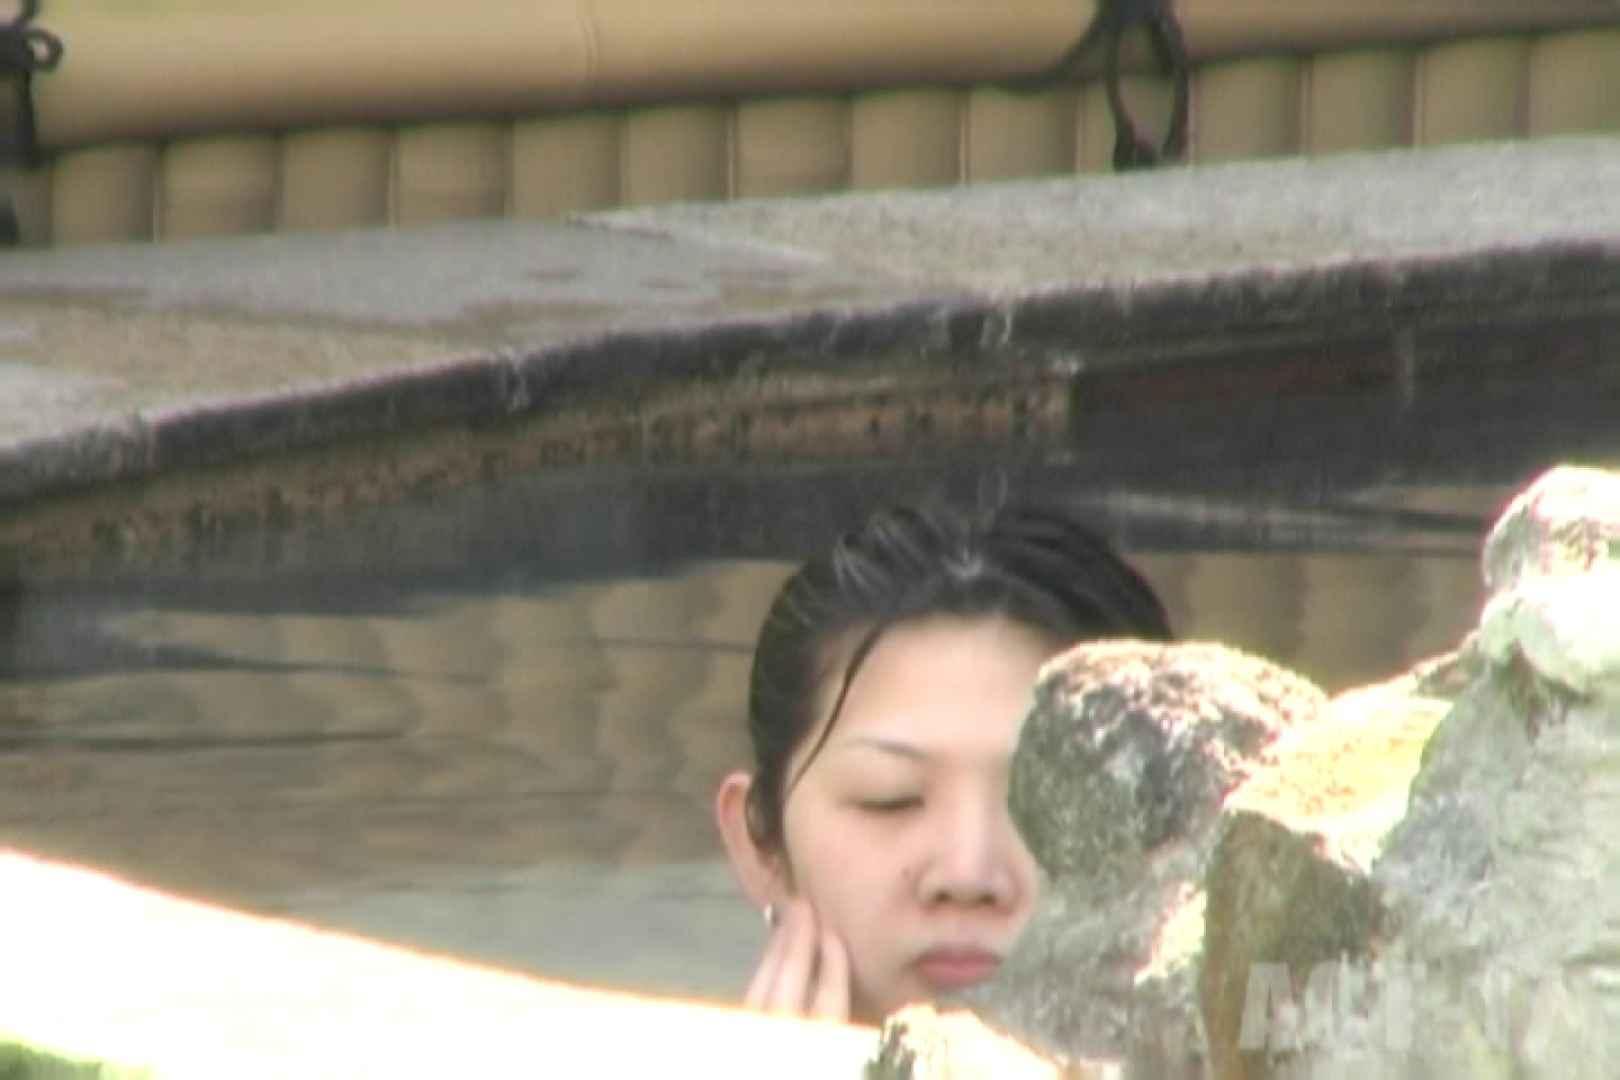 Aquaな露天風呂Vol.850 OLのエロ生活 | 露天風呂  76連発 34